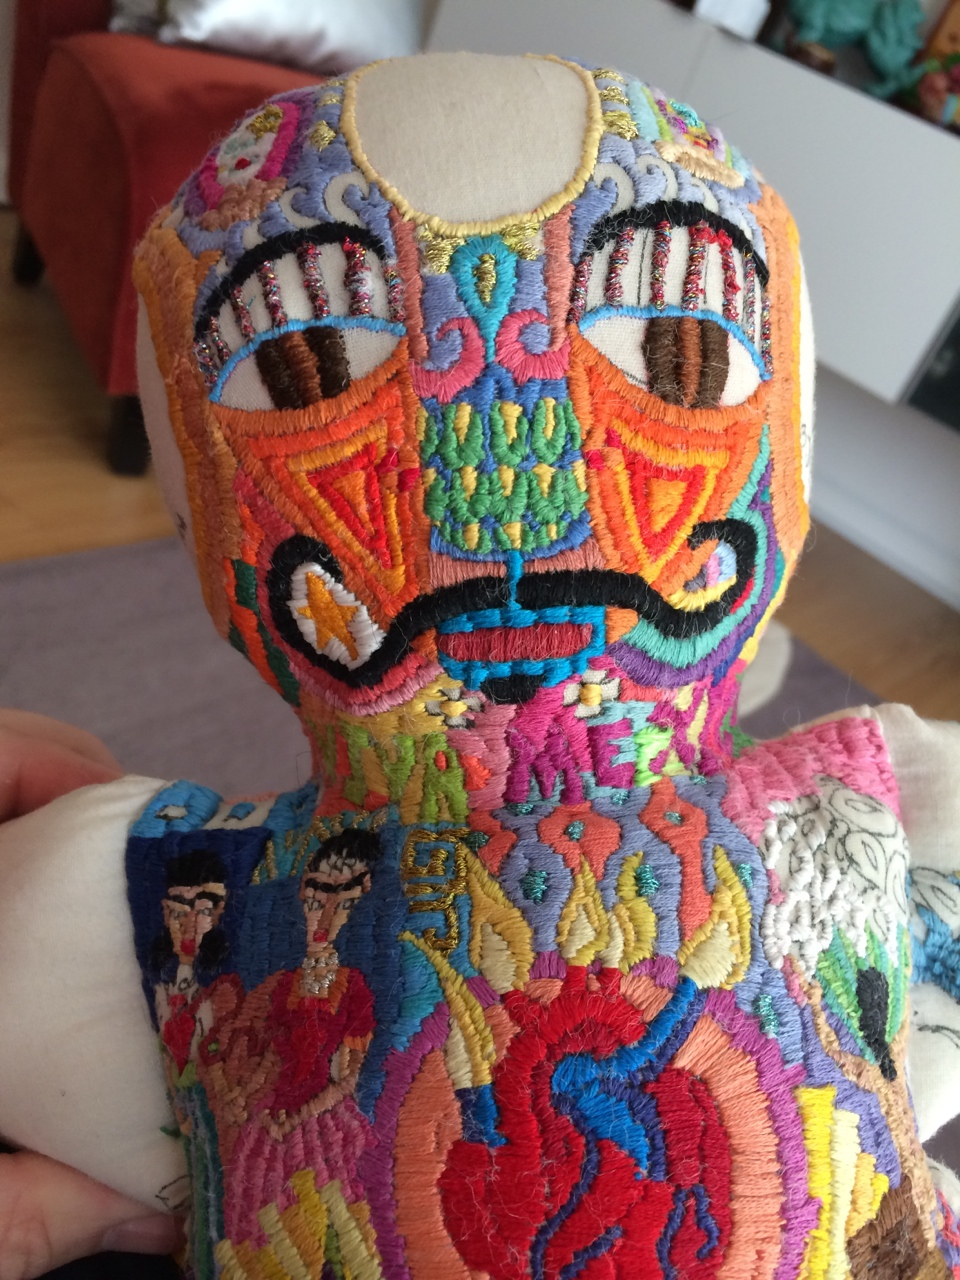 embroidered-art-dolls-2